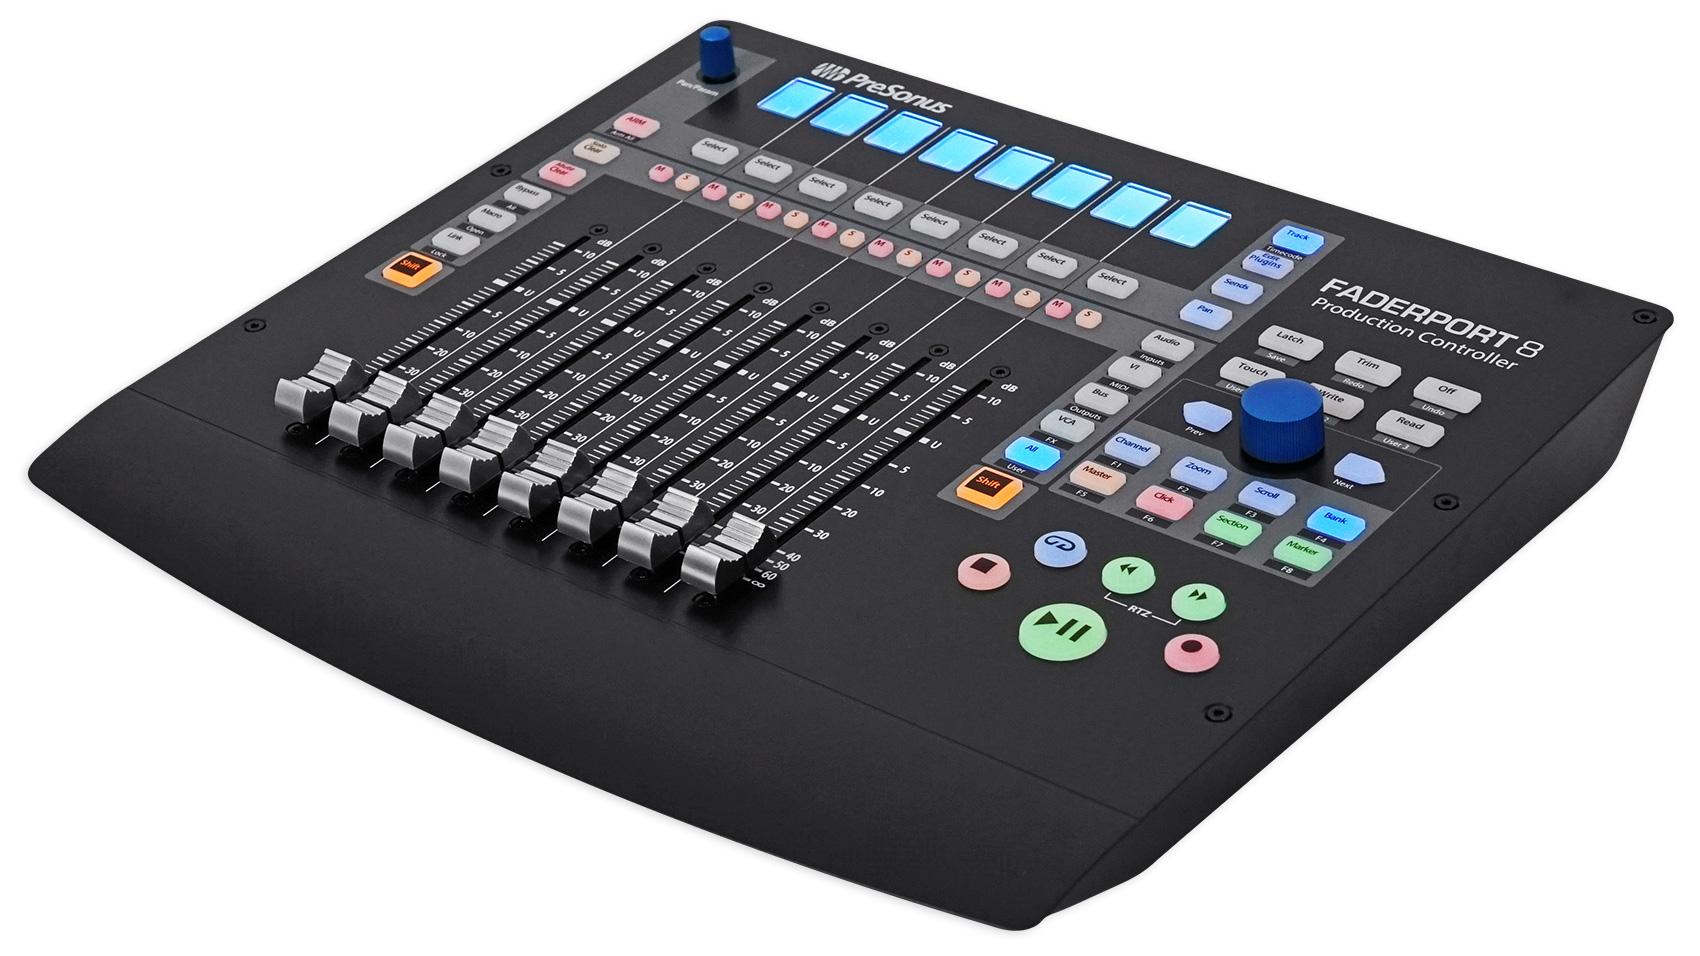 PRESONUS FADERPORT 8 USB 8-Channel Mix Production DAW Controller Mac/PC  713803236766 | eBay